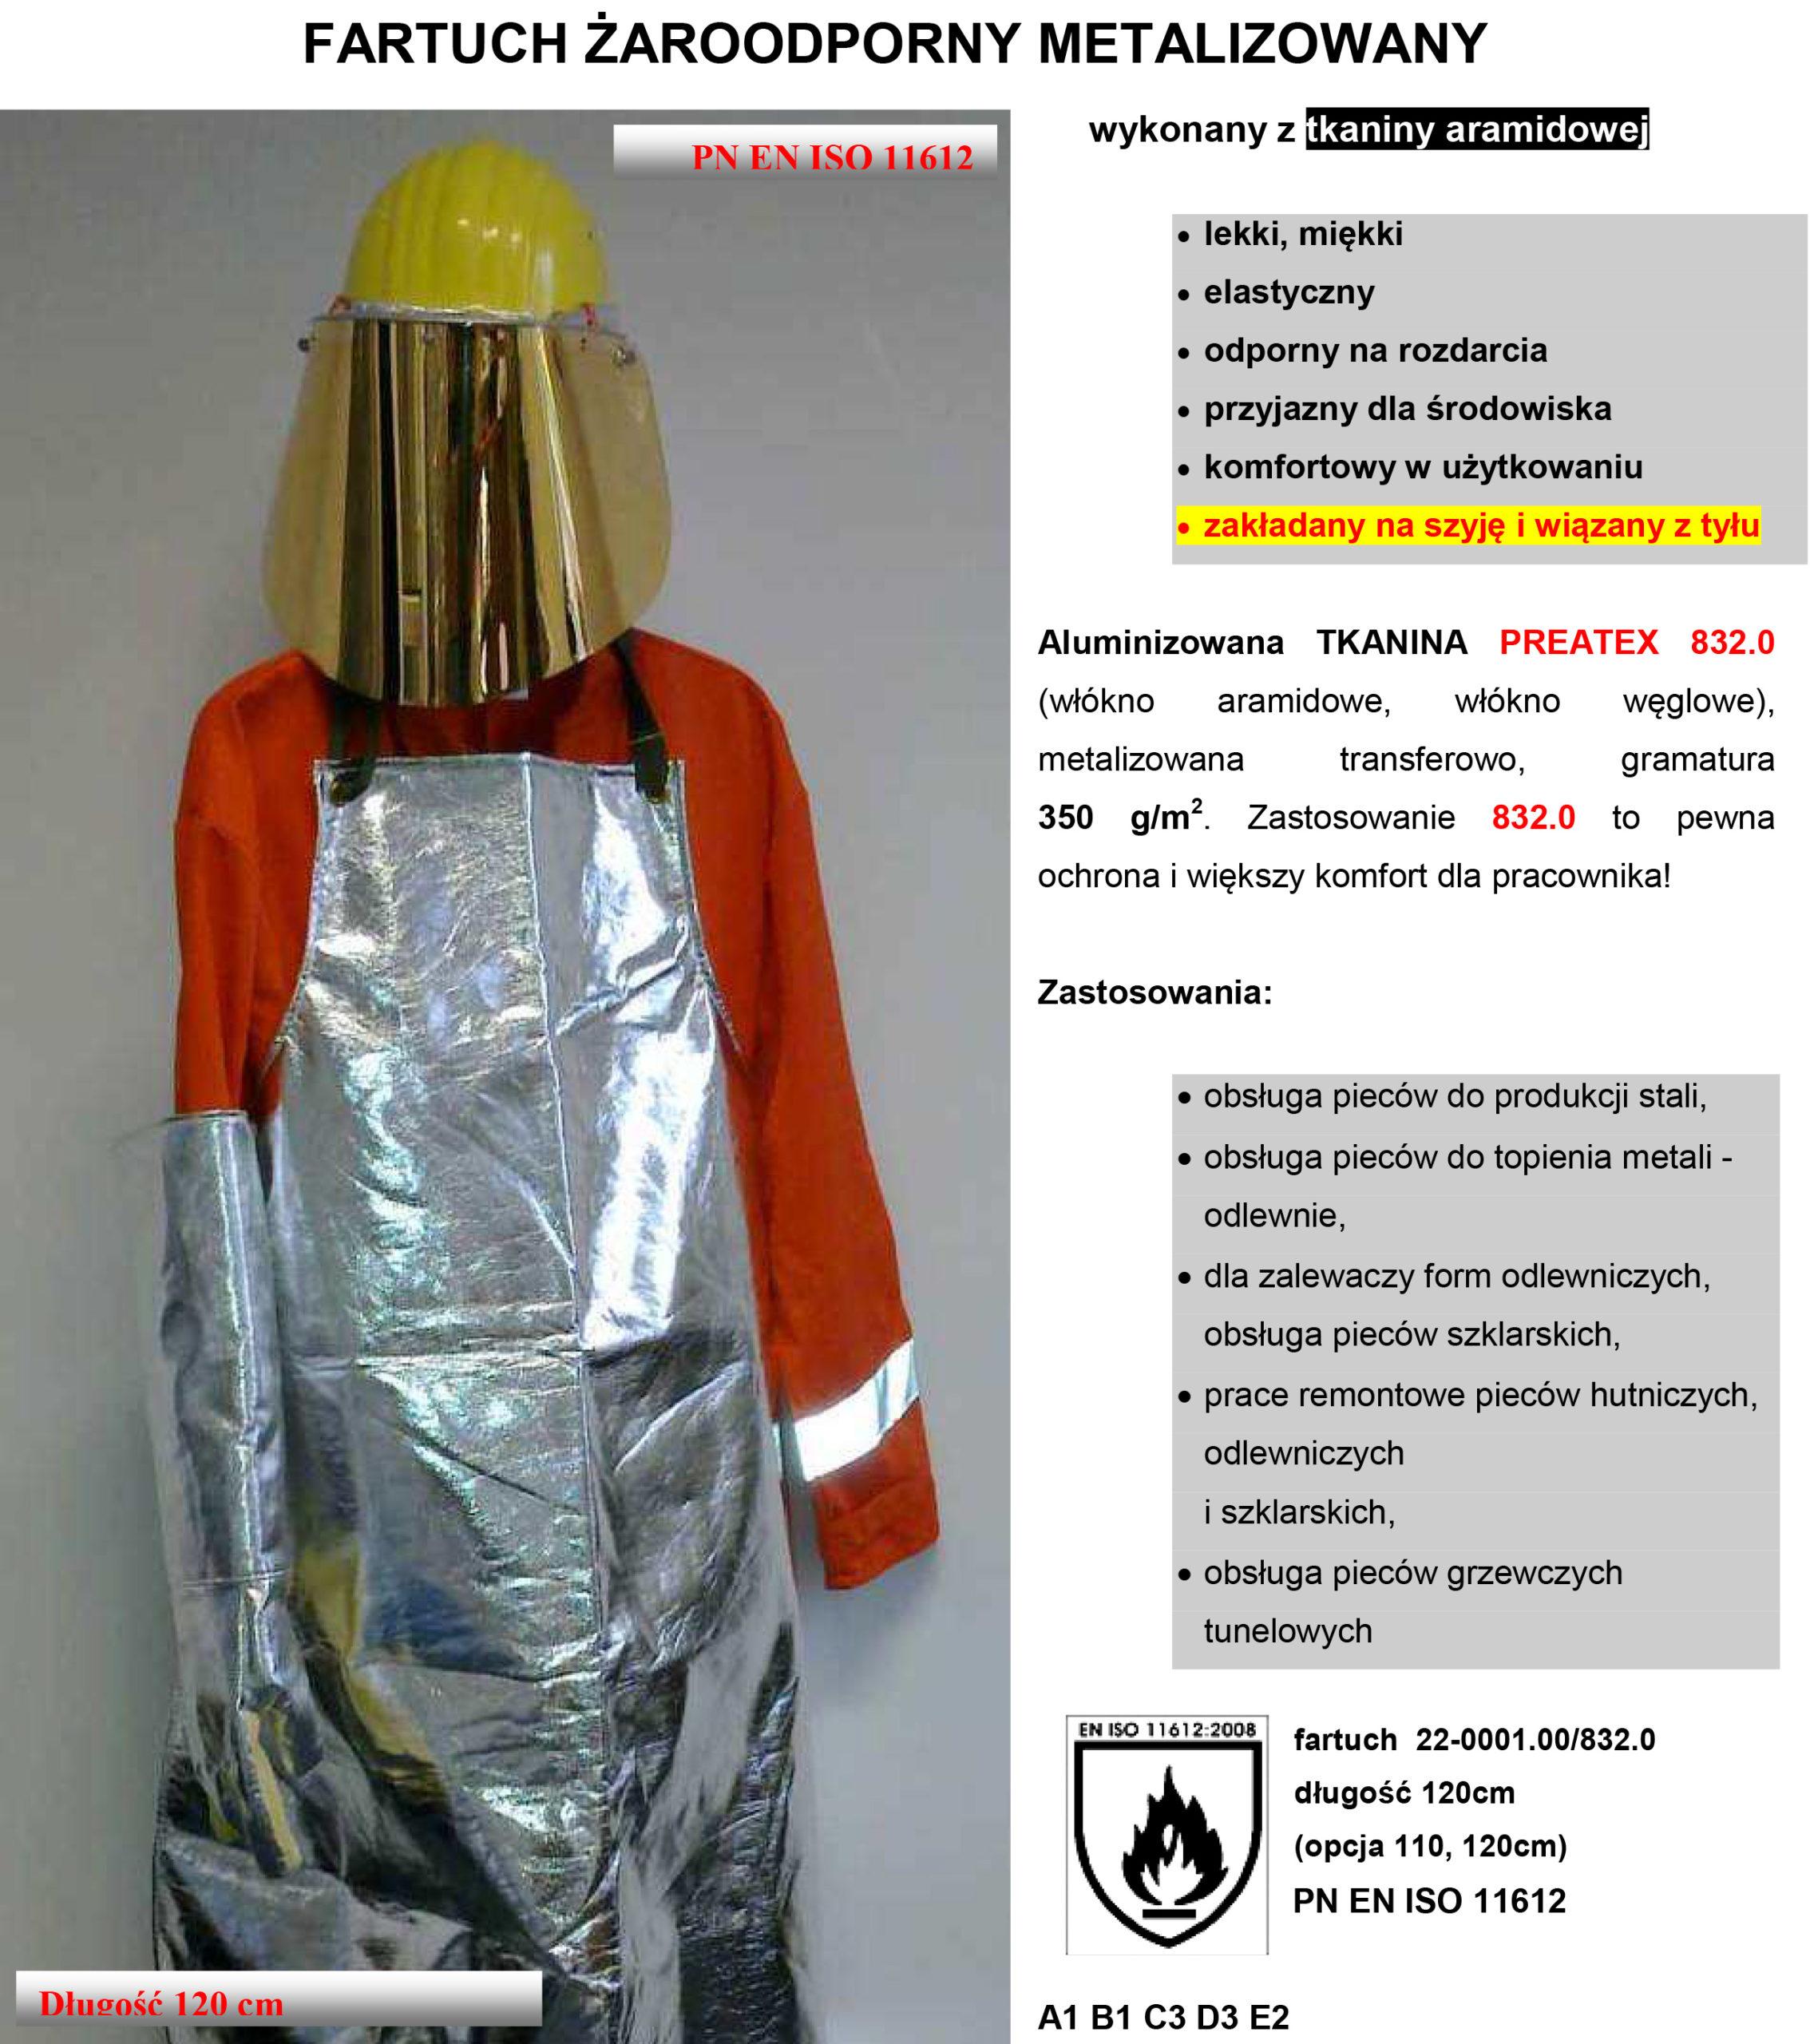 fartuch żaroodporny metalizowany